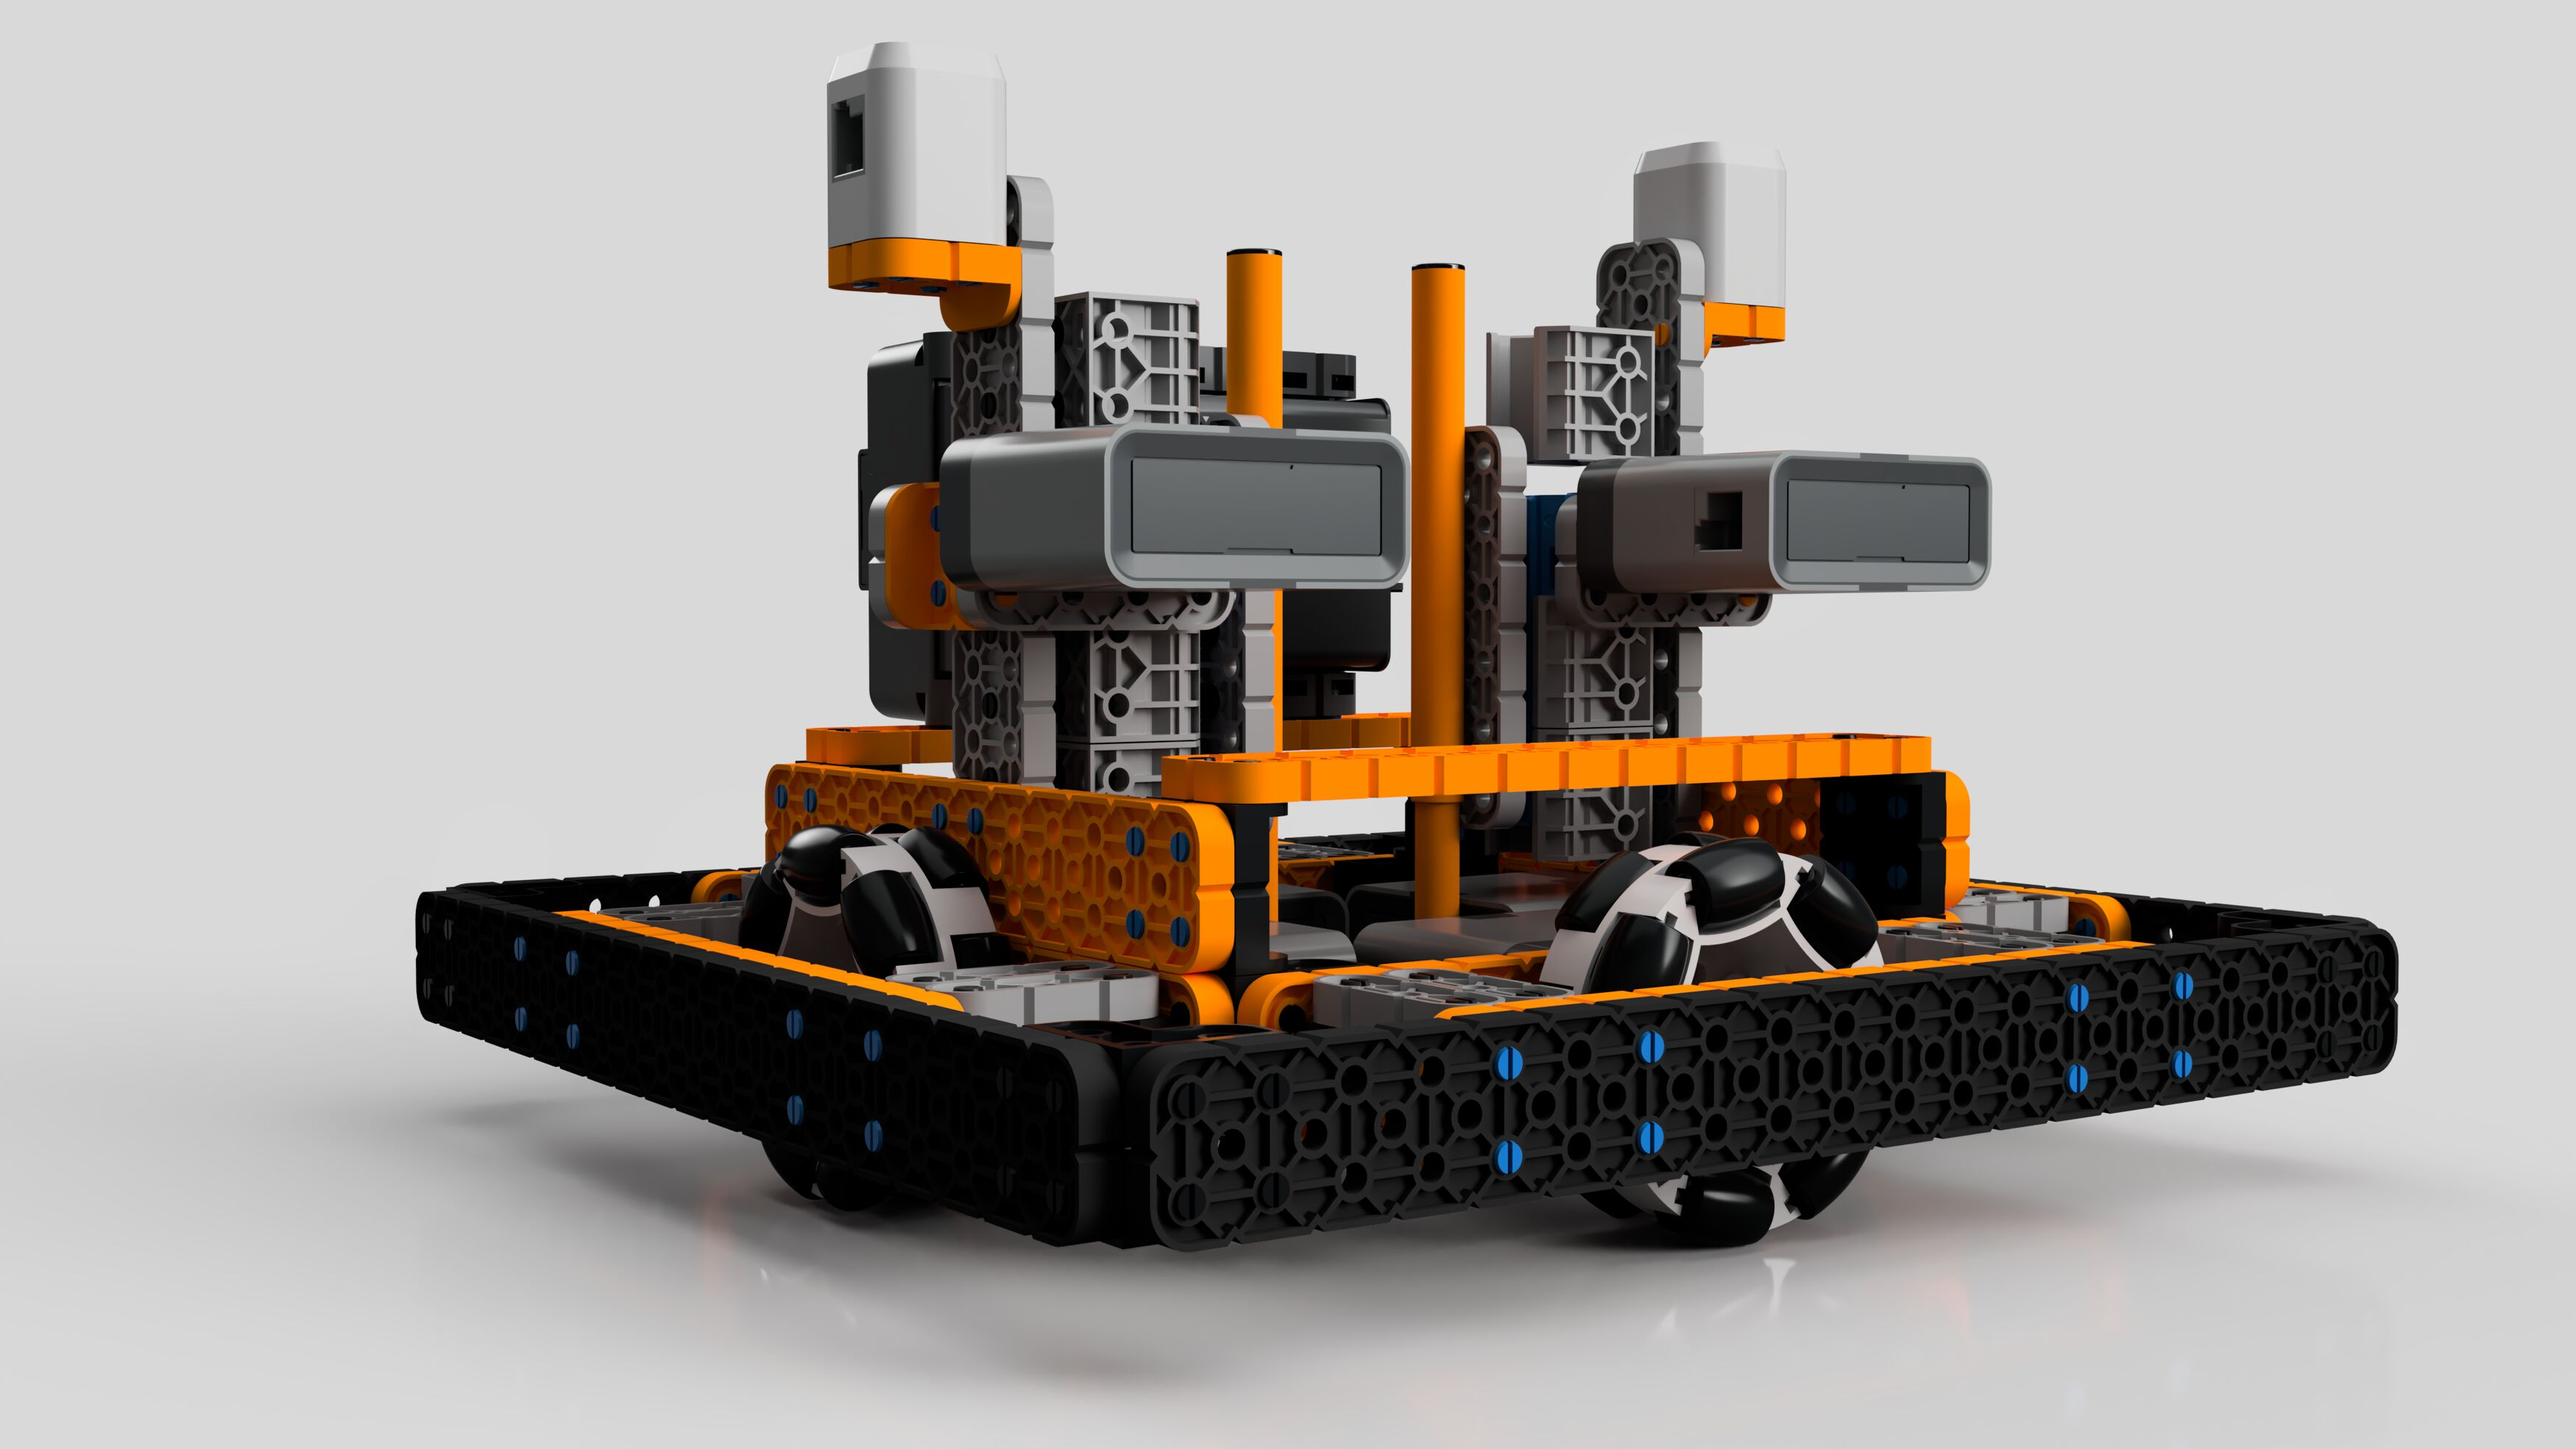 Robotics-pen-oficial-2-cores---fabrica-de-nerdes-2020-may-28-08-03-15pm-000-customizedview11129500108-png-3500-3500